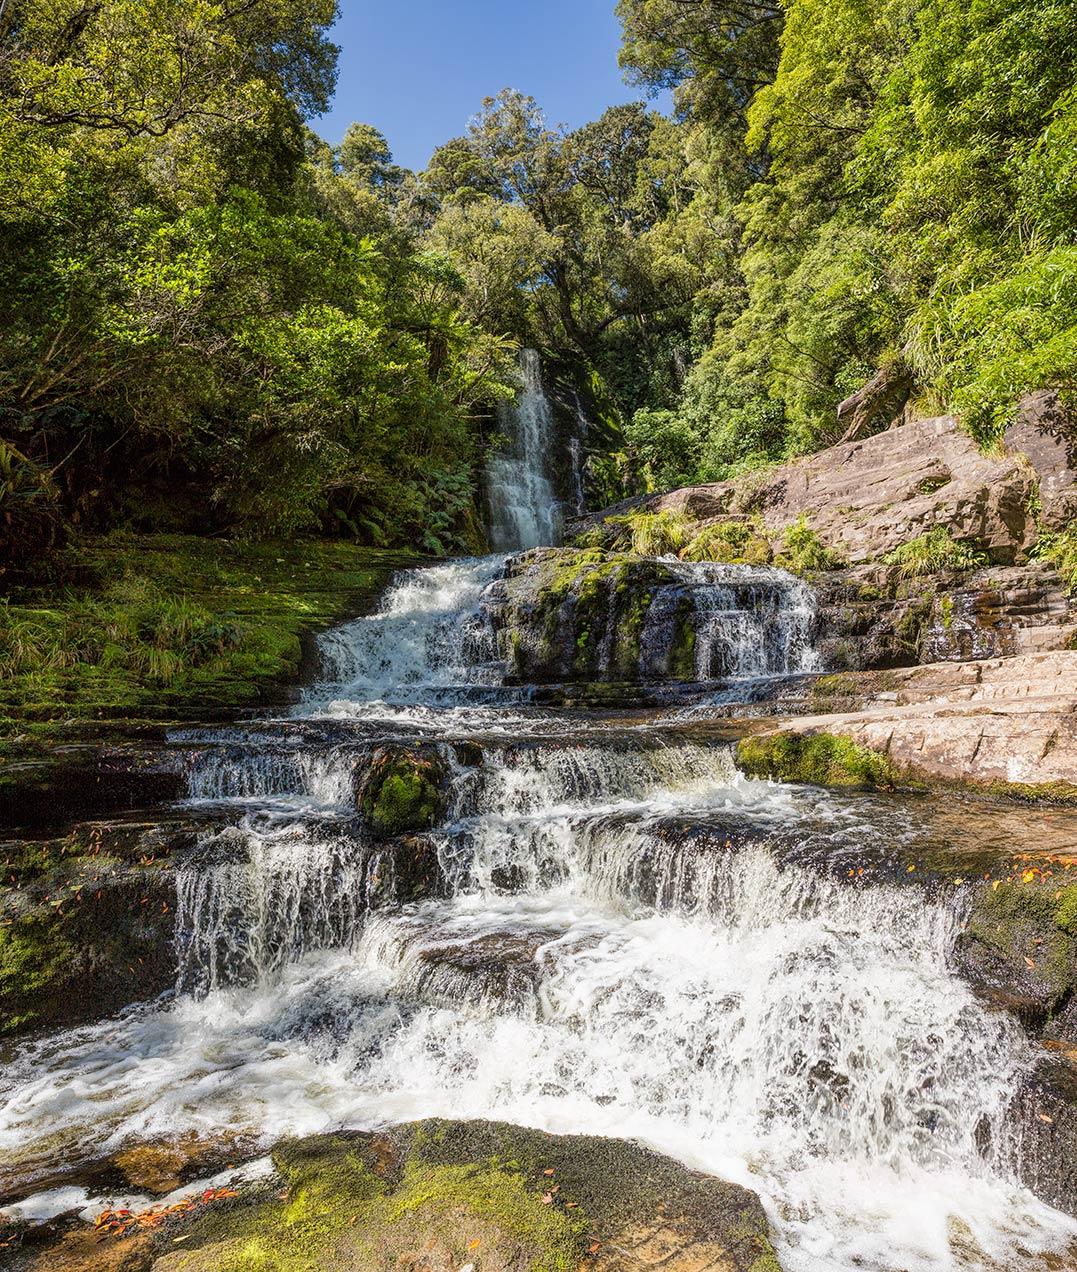 McLean Falls © Michael Evans Photographer 2015